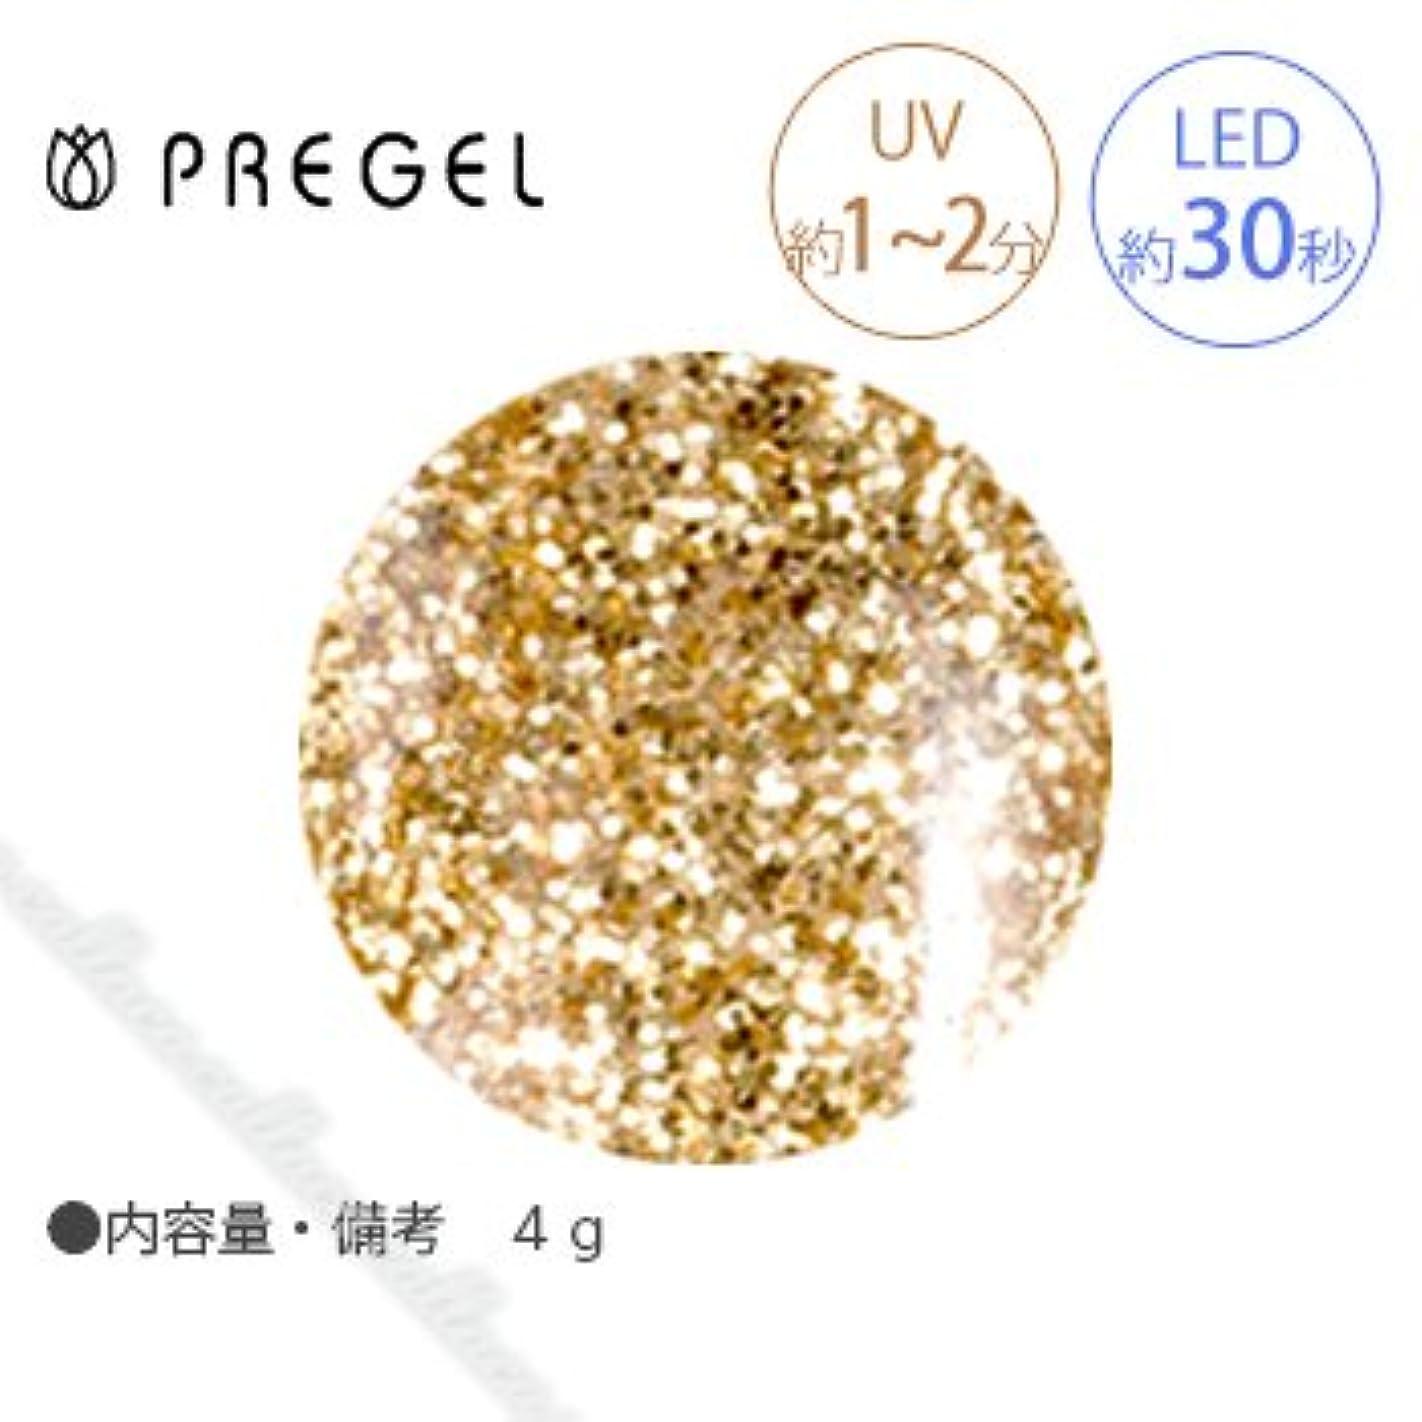 【PREGEL】 プリジェル カラーEX ダイヤモンドシリーズ ダイヤモンドブロンズ PG-CE402 4g